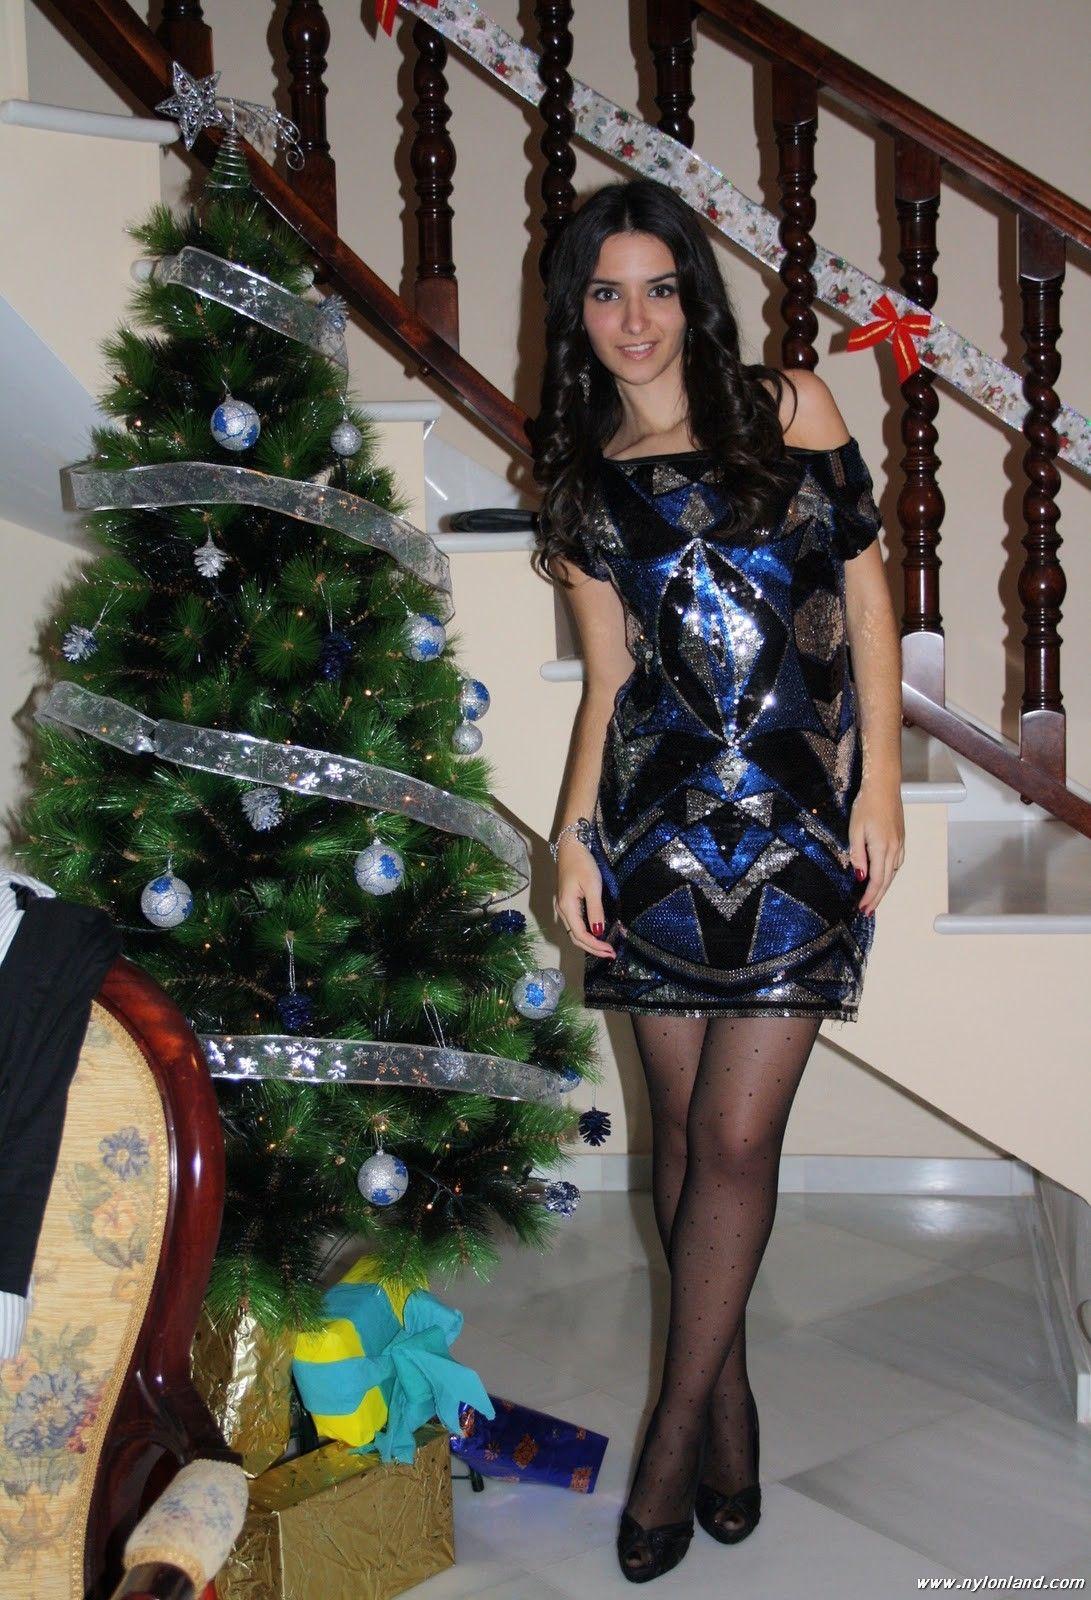 nylons #stockings #collants #pantyhose #legs #HighHeels #babe ...